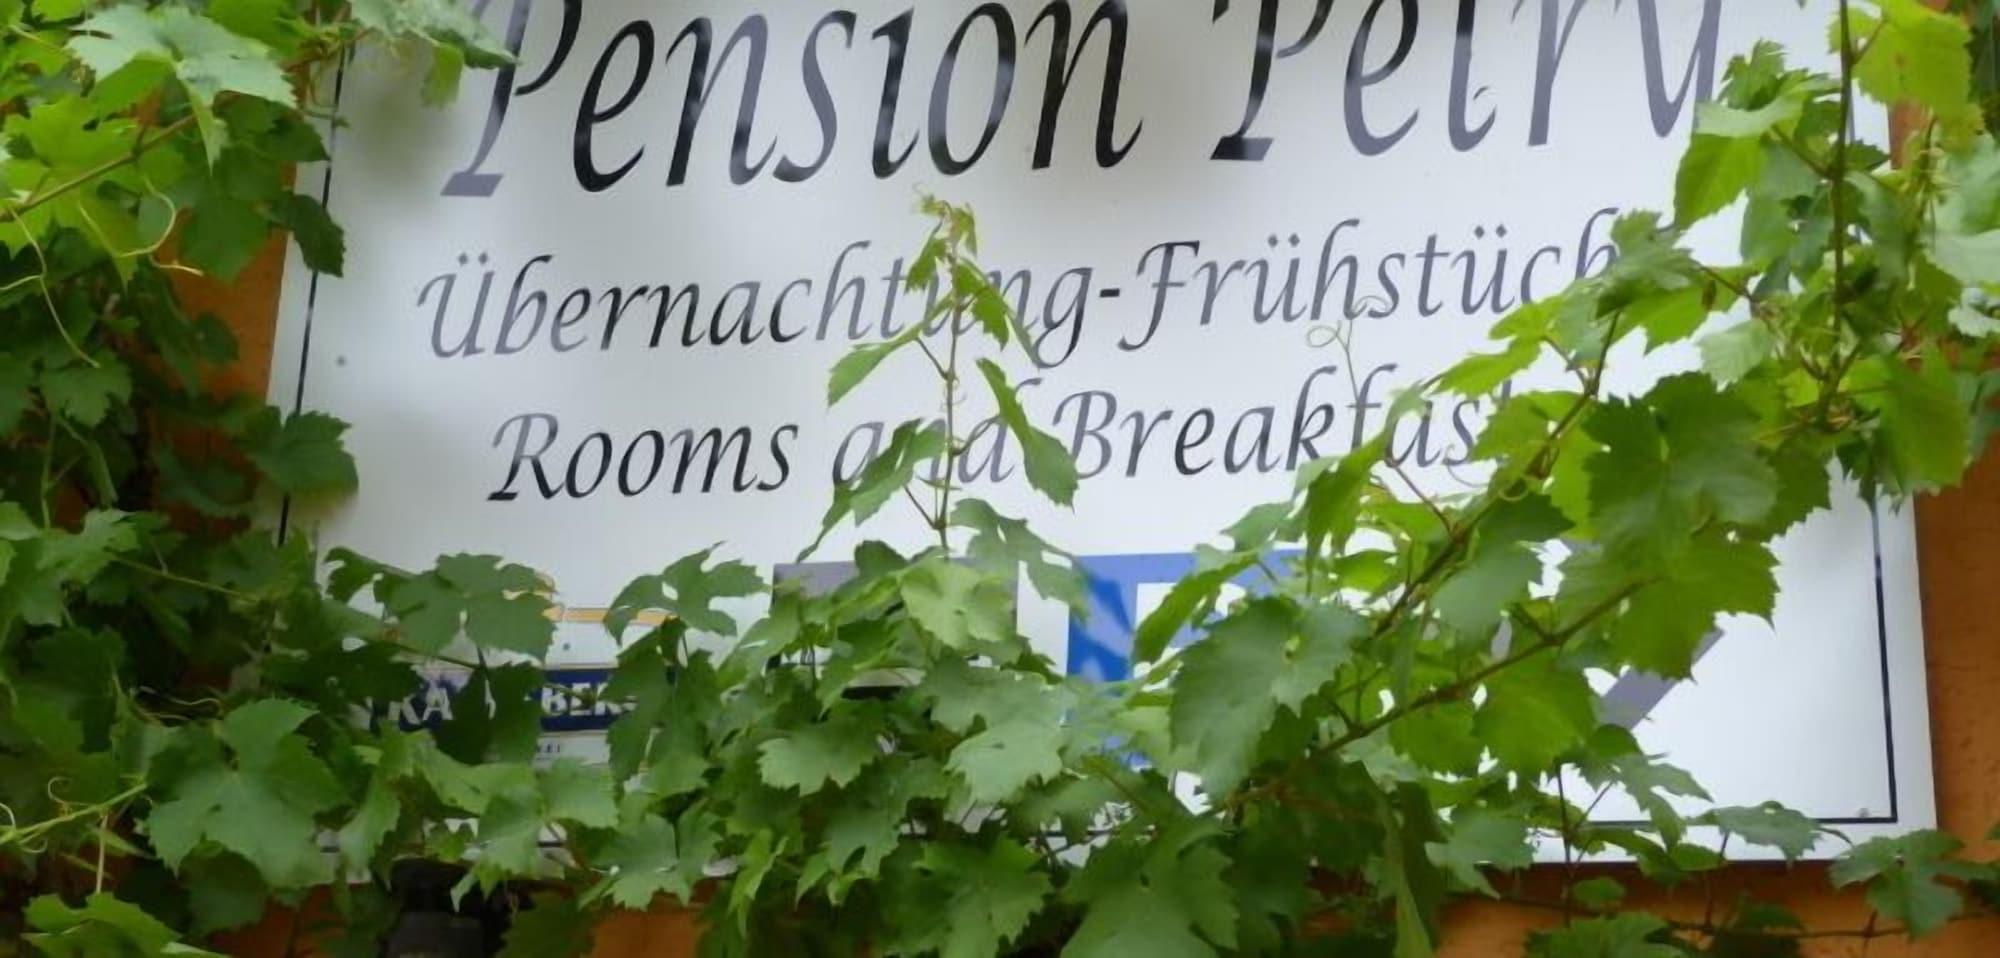 Pension Petry, Bad Dürkheim